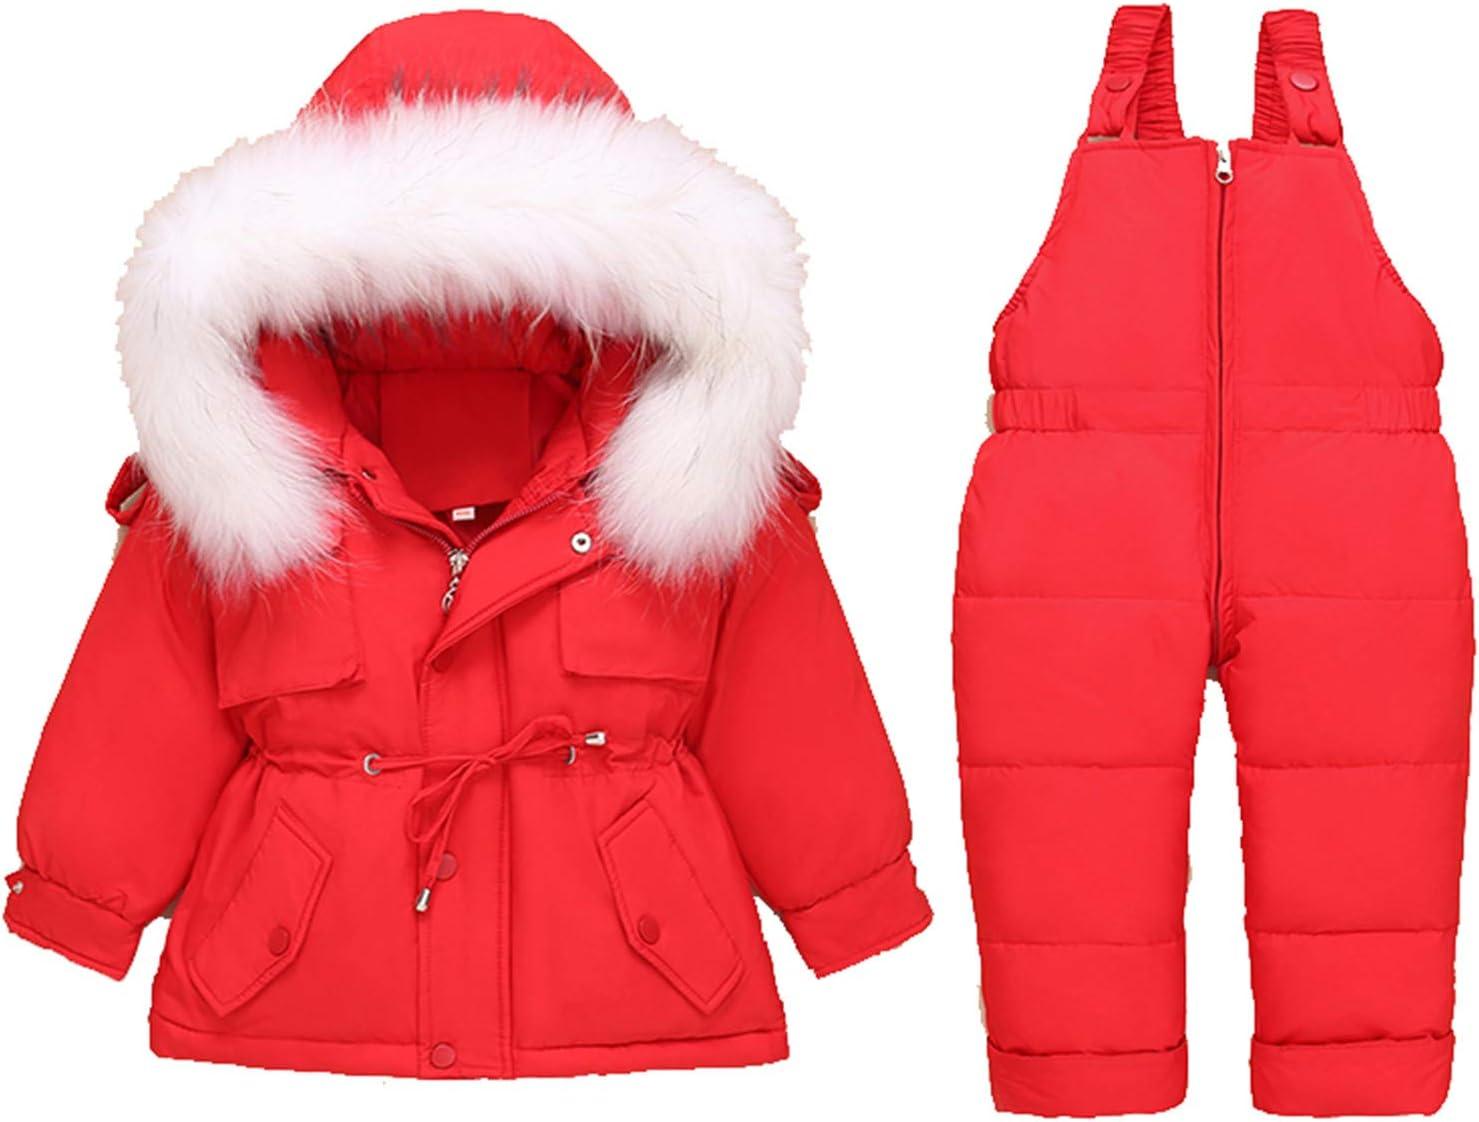 Baby Unisex Winter Puffer Snowsuit Down Bib wholesale Ski and Jacket Snow Max 70% OFF